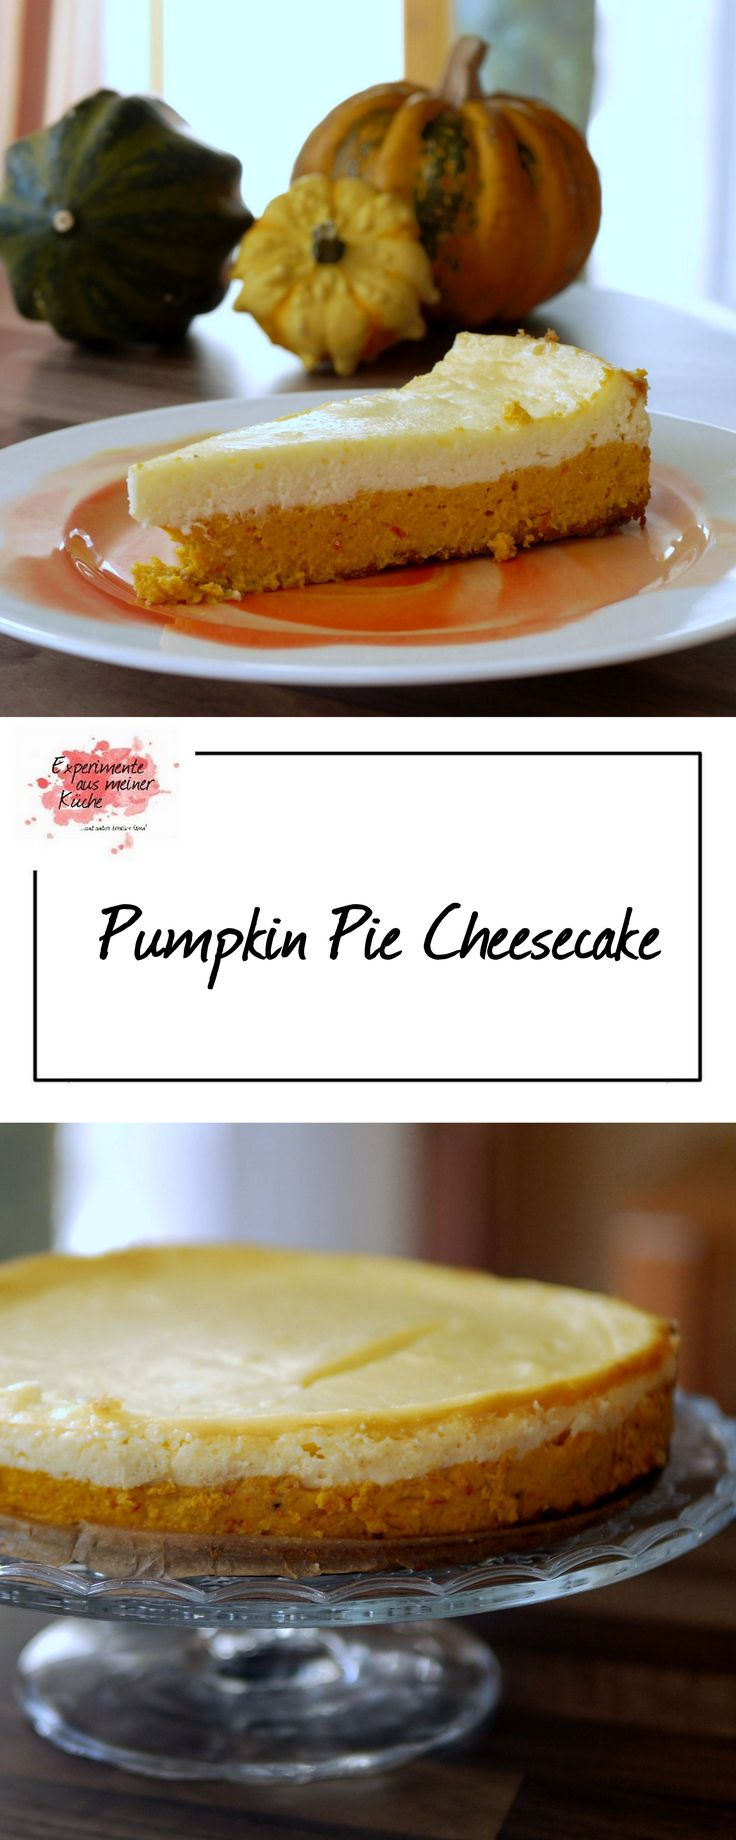 Pumpkin Pie Cheesecake | Rezept | Backen | Kuchen | Kürbis